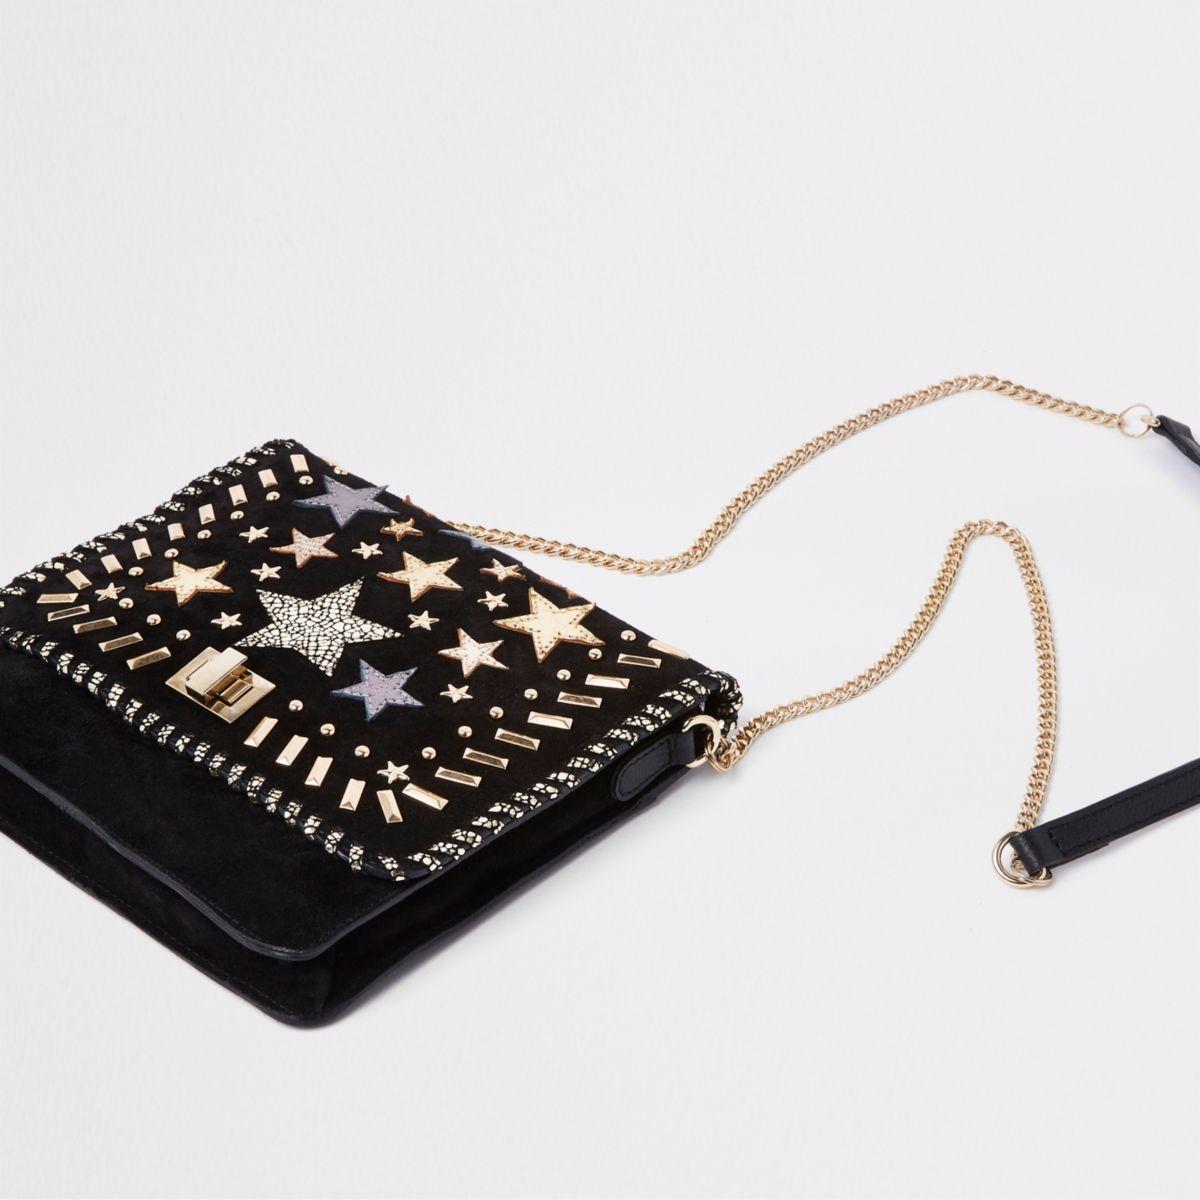 Black leather star studded cross body bag